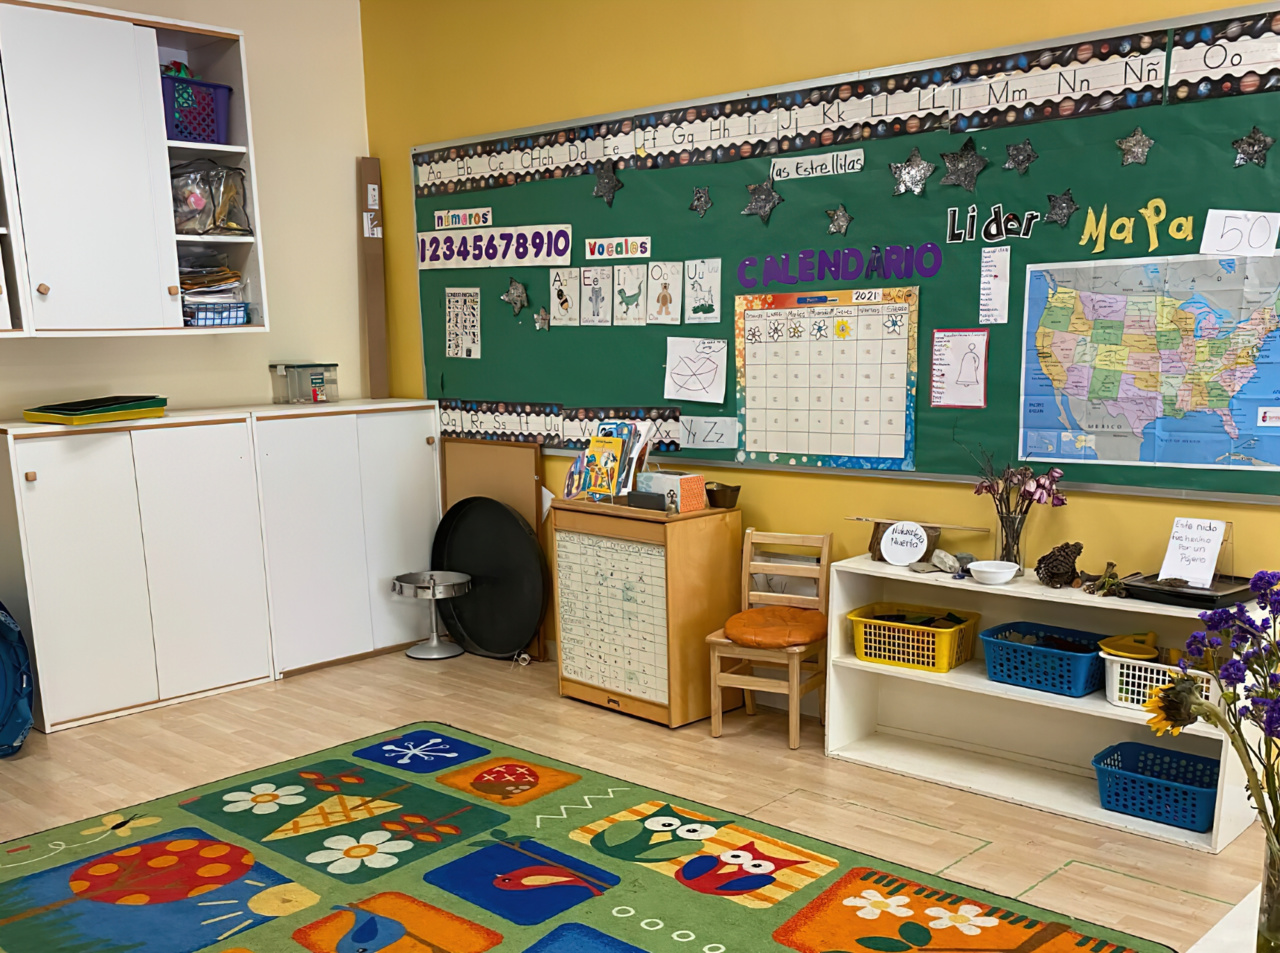 Spanish Immersion School & Daycare 5